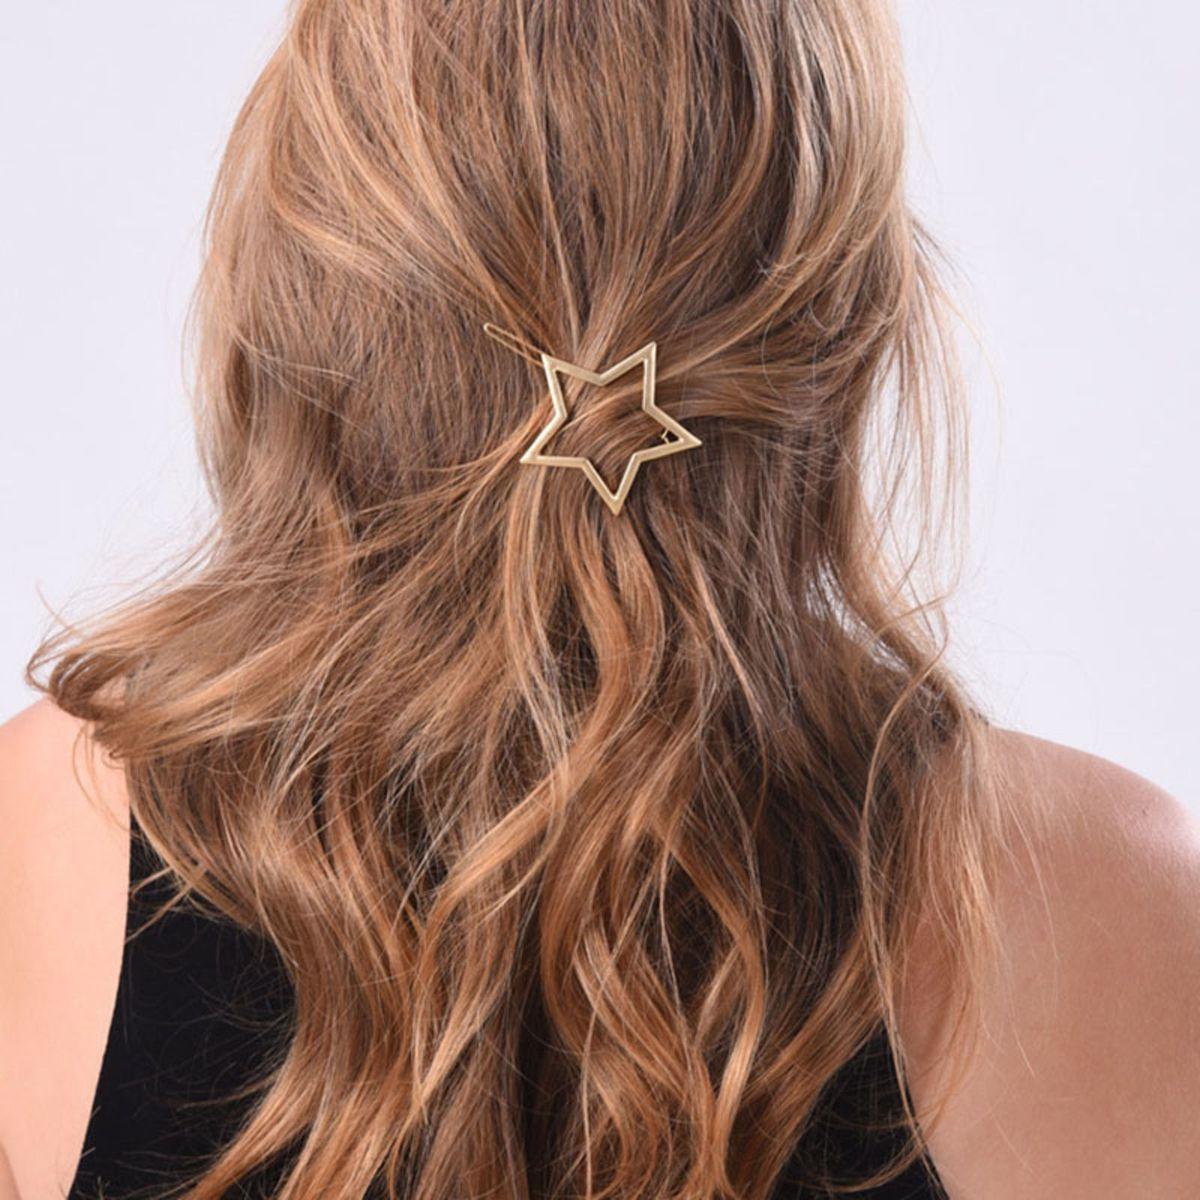 clip presilha grampo tic tac estrela - cabelos sem marca